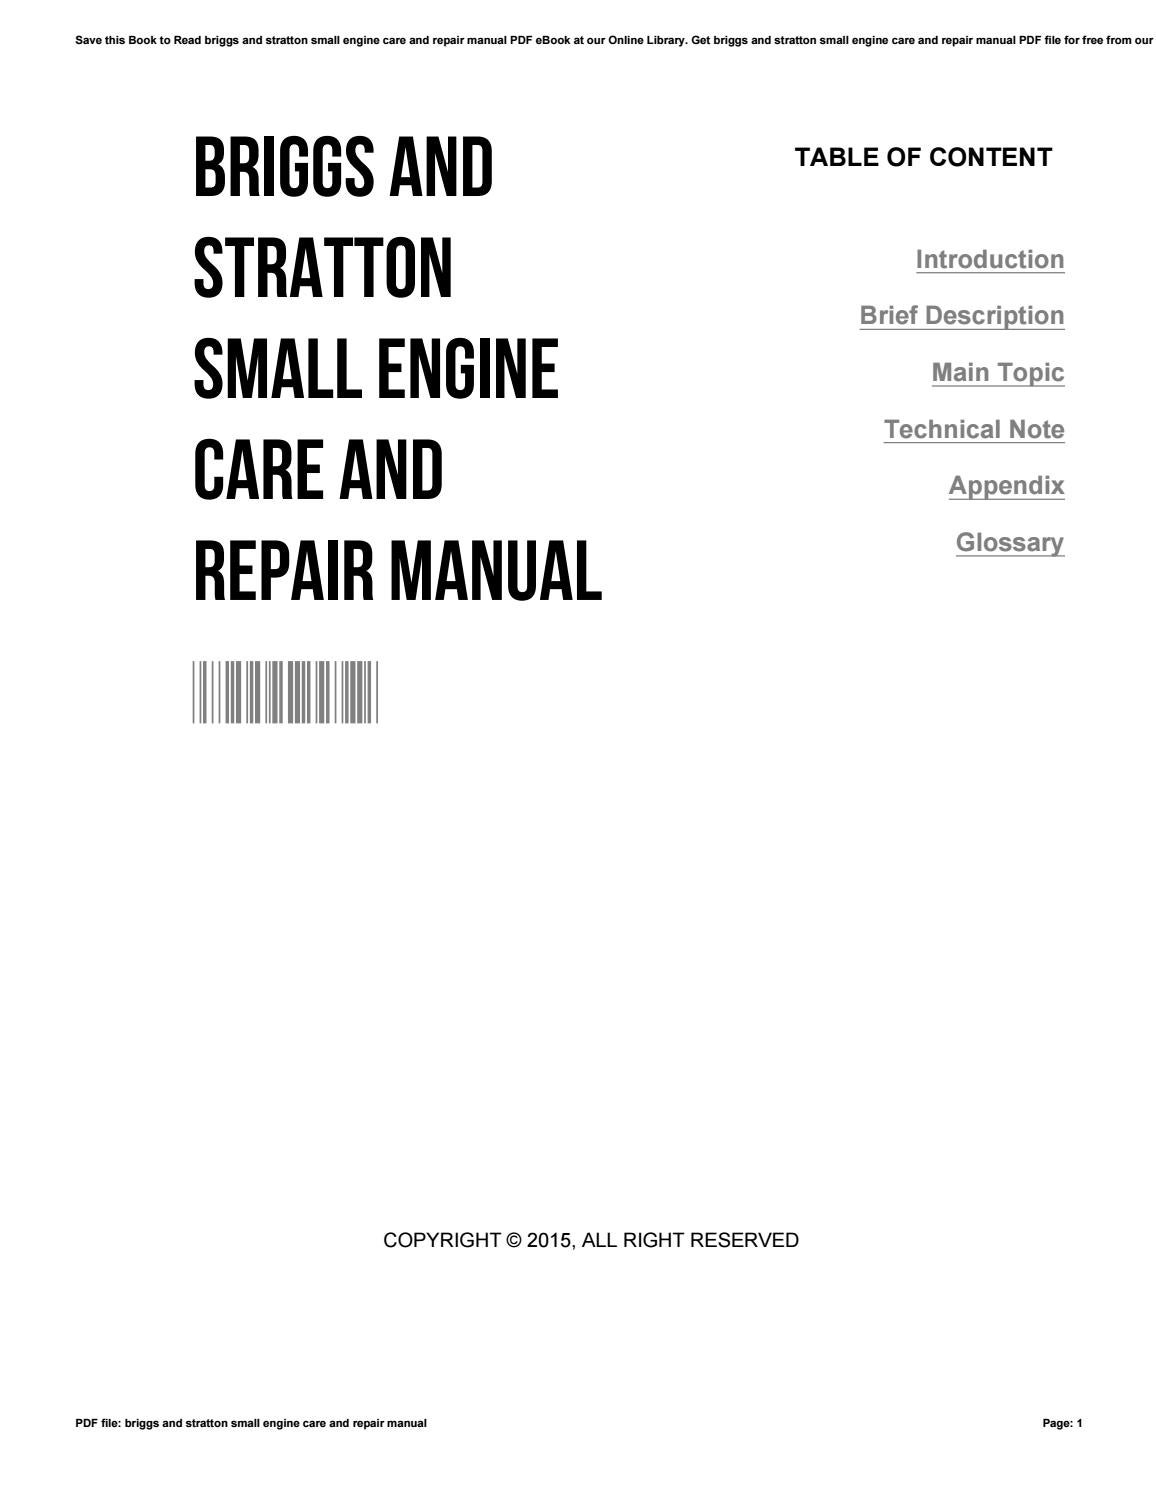 briggs and stratton repair manual pdf free